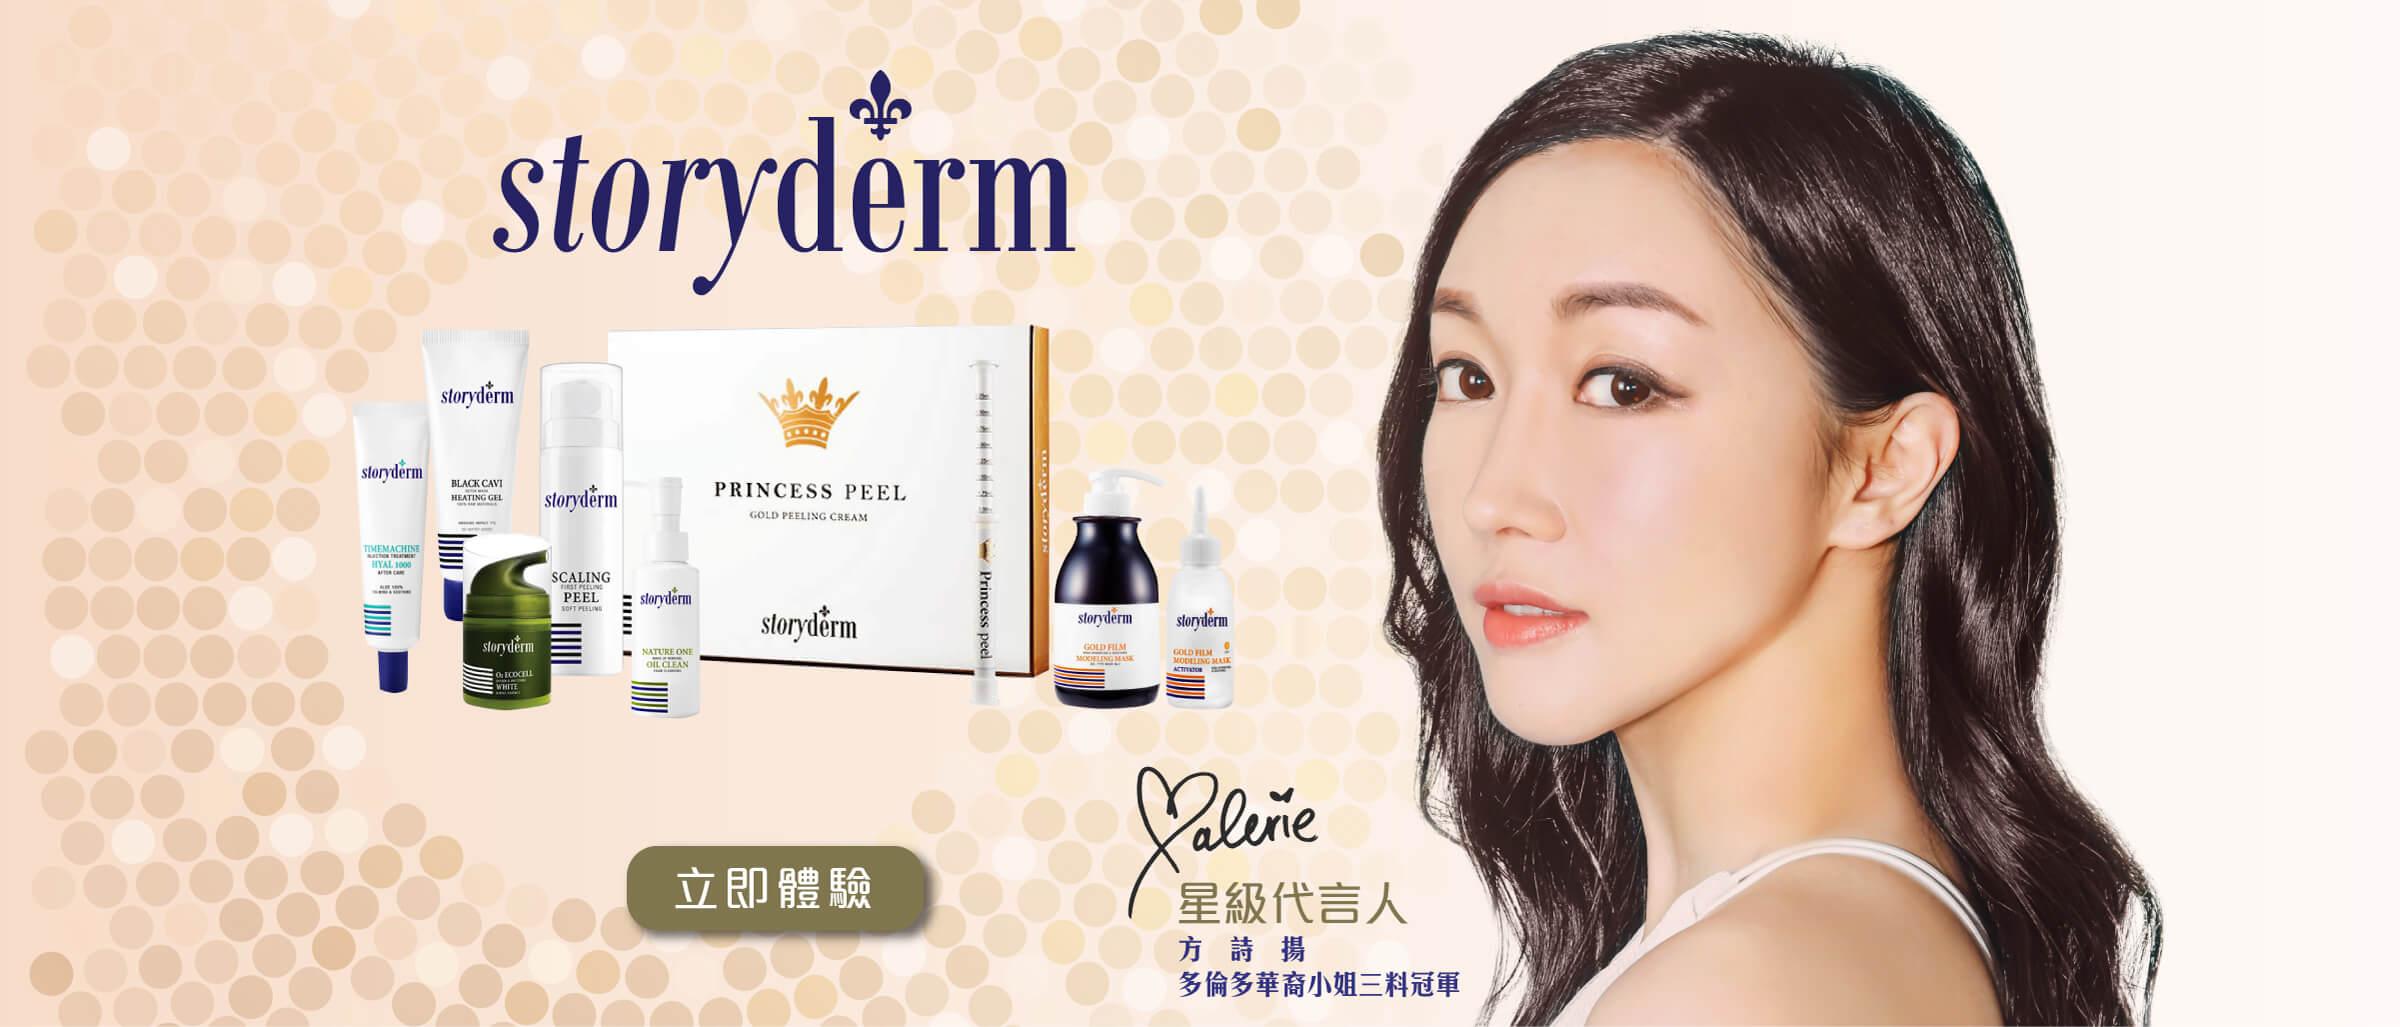 STORYDERM韓國公主針